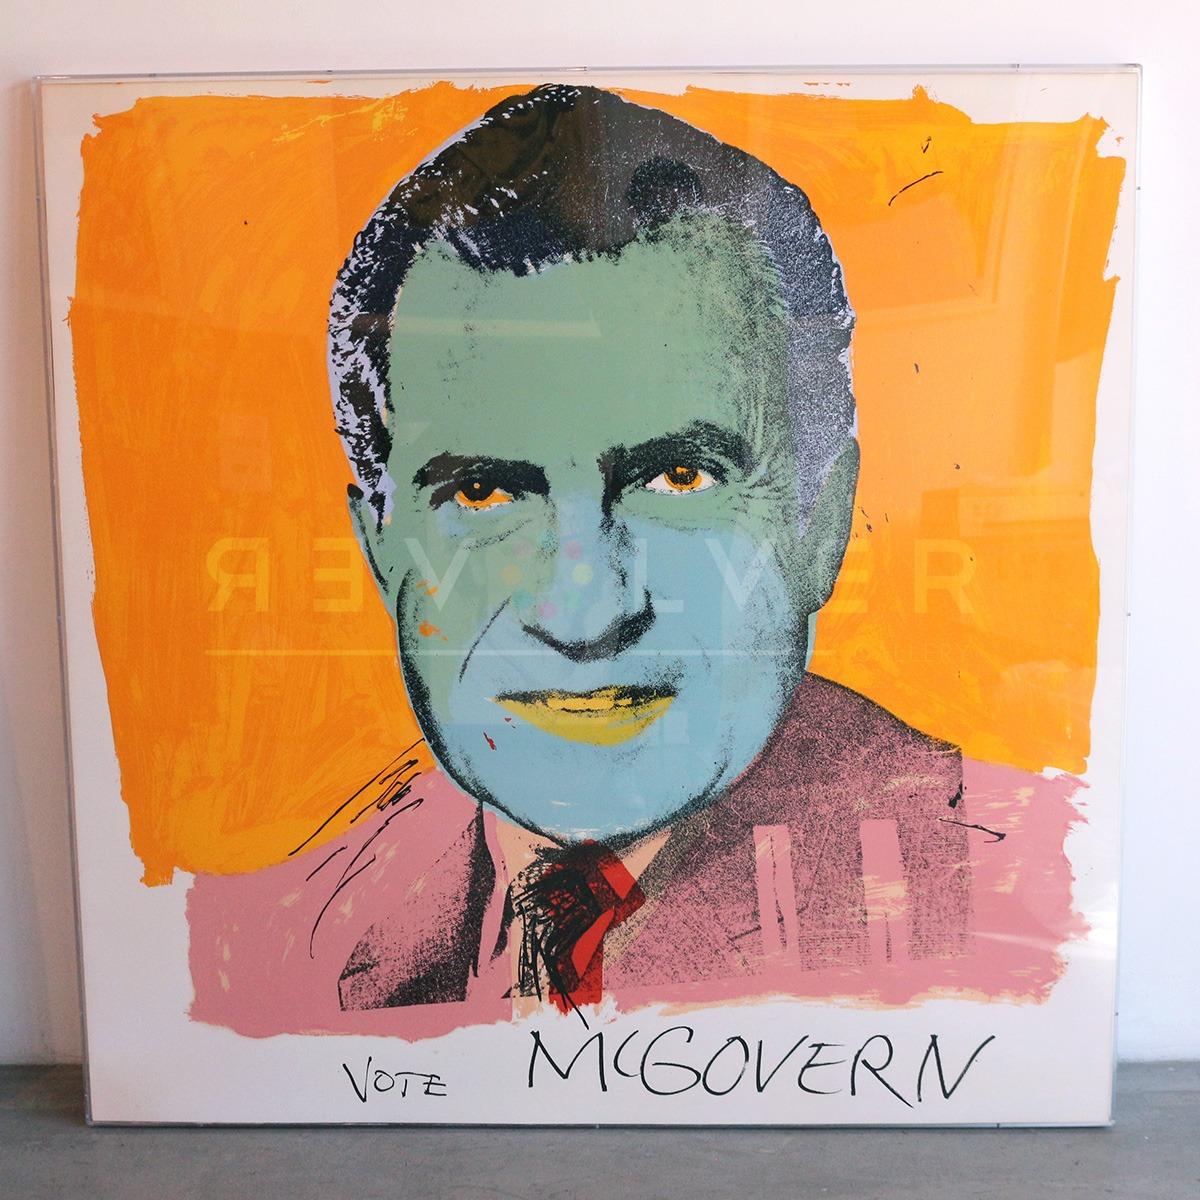 Andy Warhol - Vote McGovern F.S. II 84 jpg